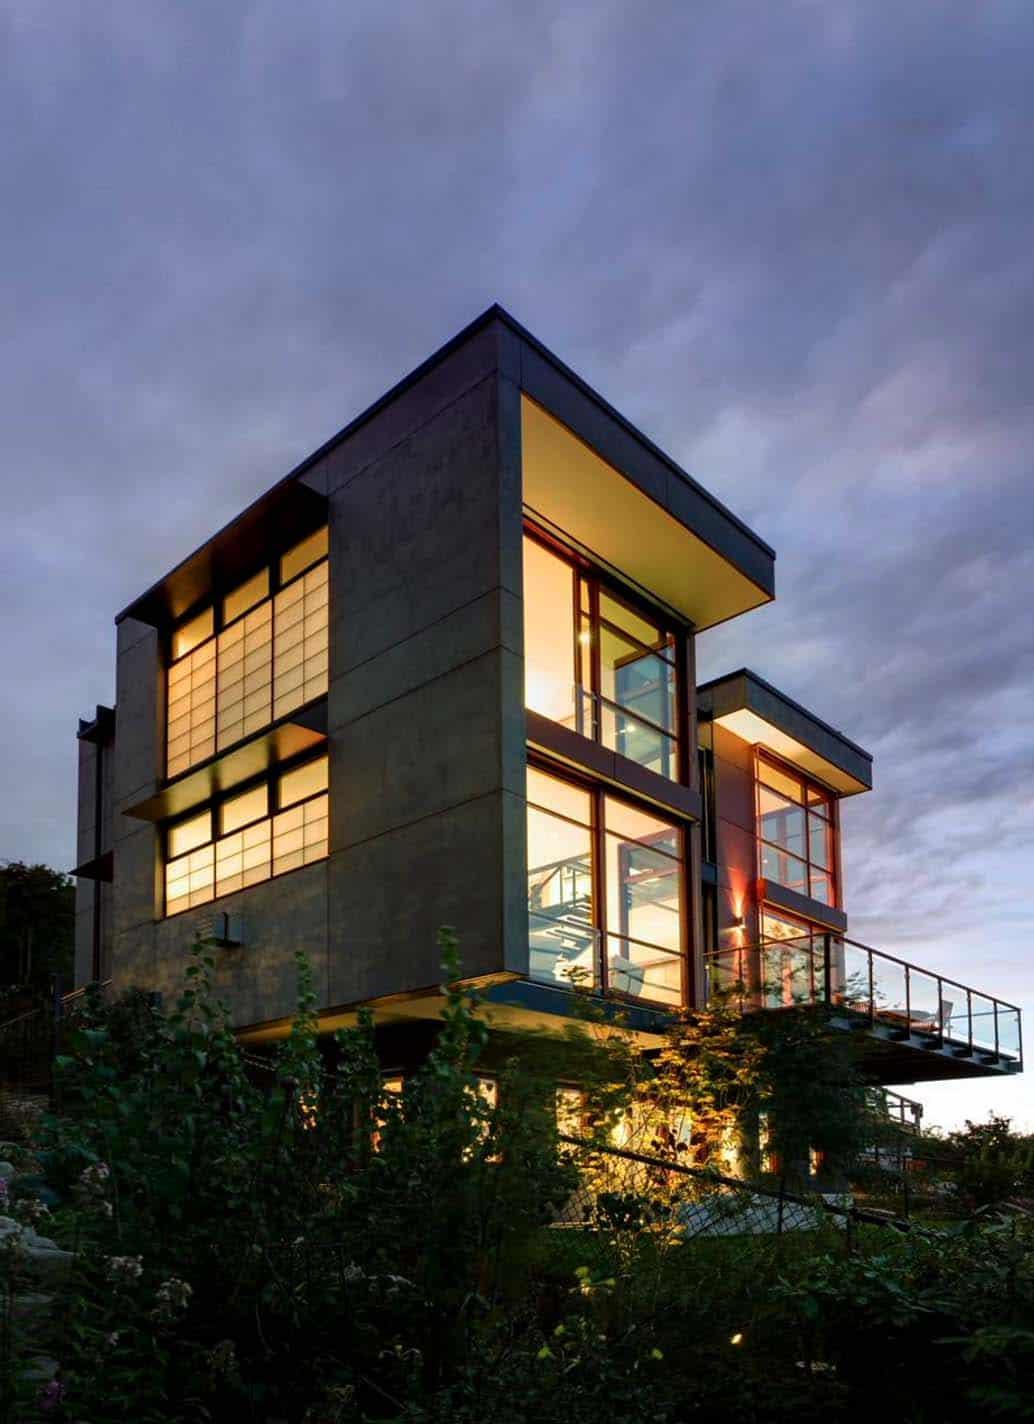 Sustainable Urban Home-Prentiss Balance Wickline Architects-14-1 Kindesign